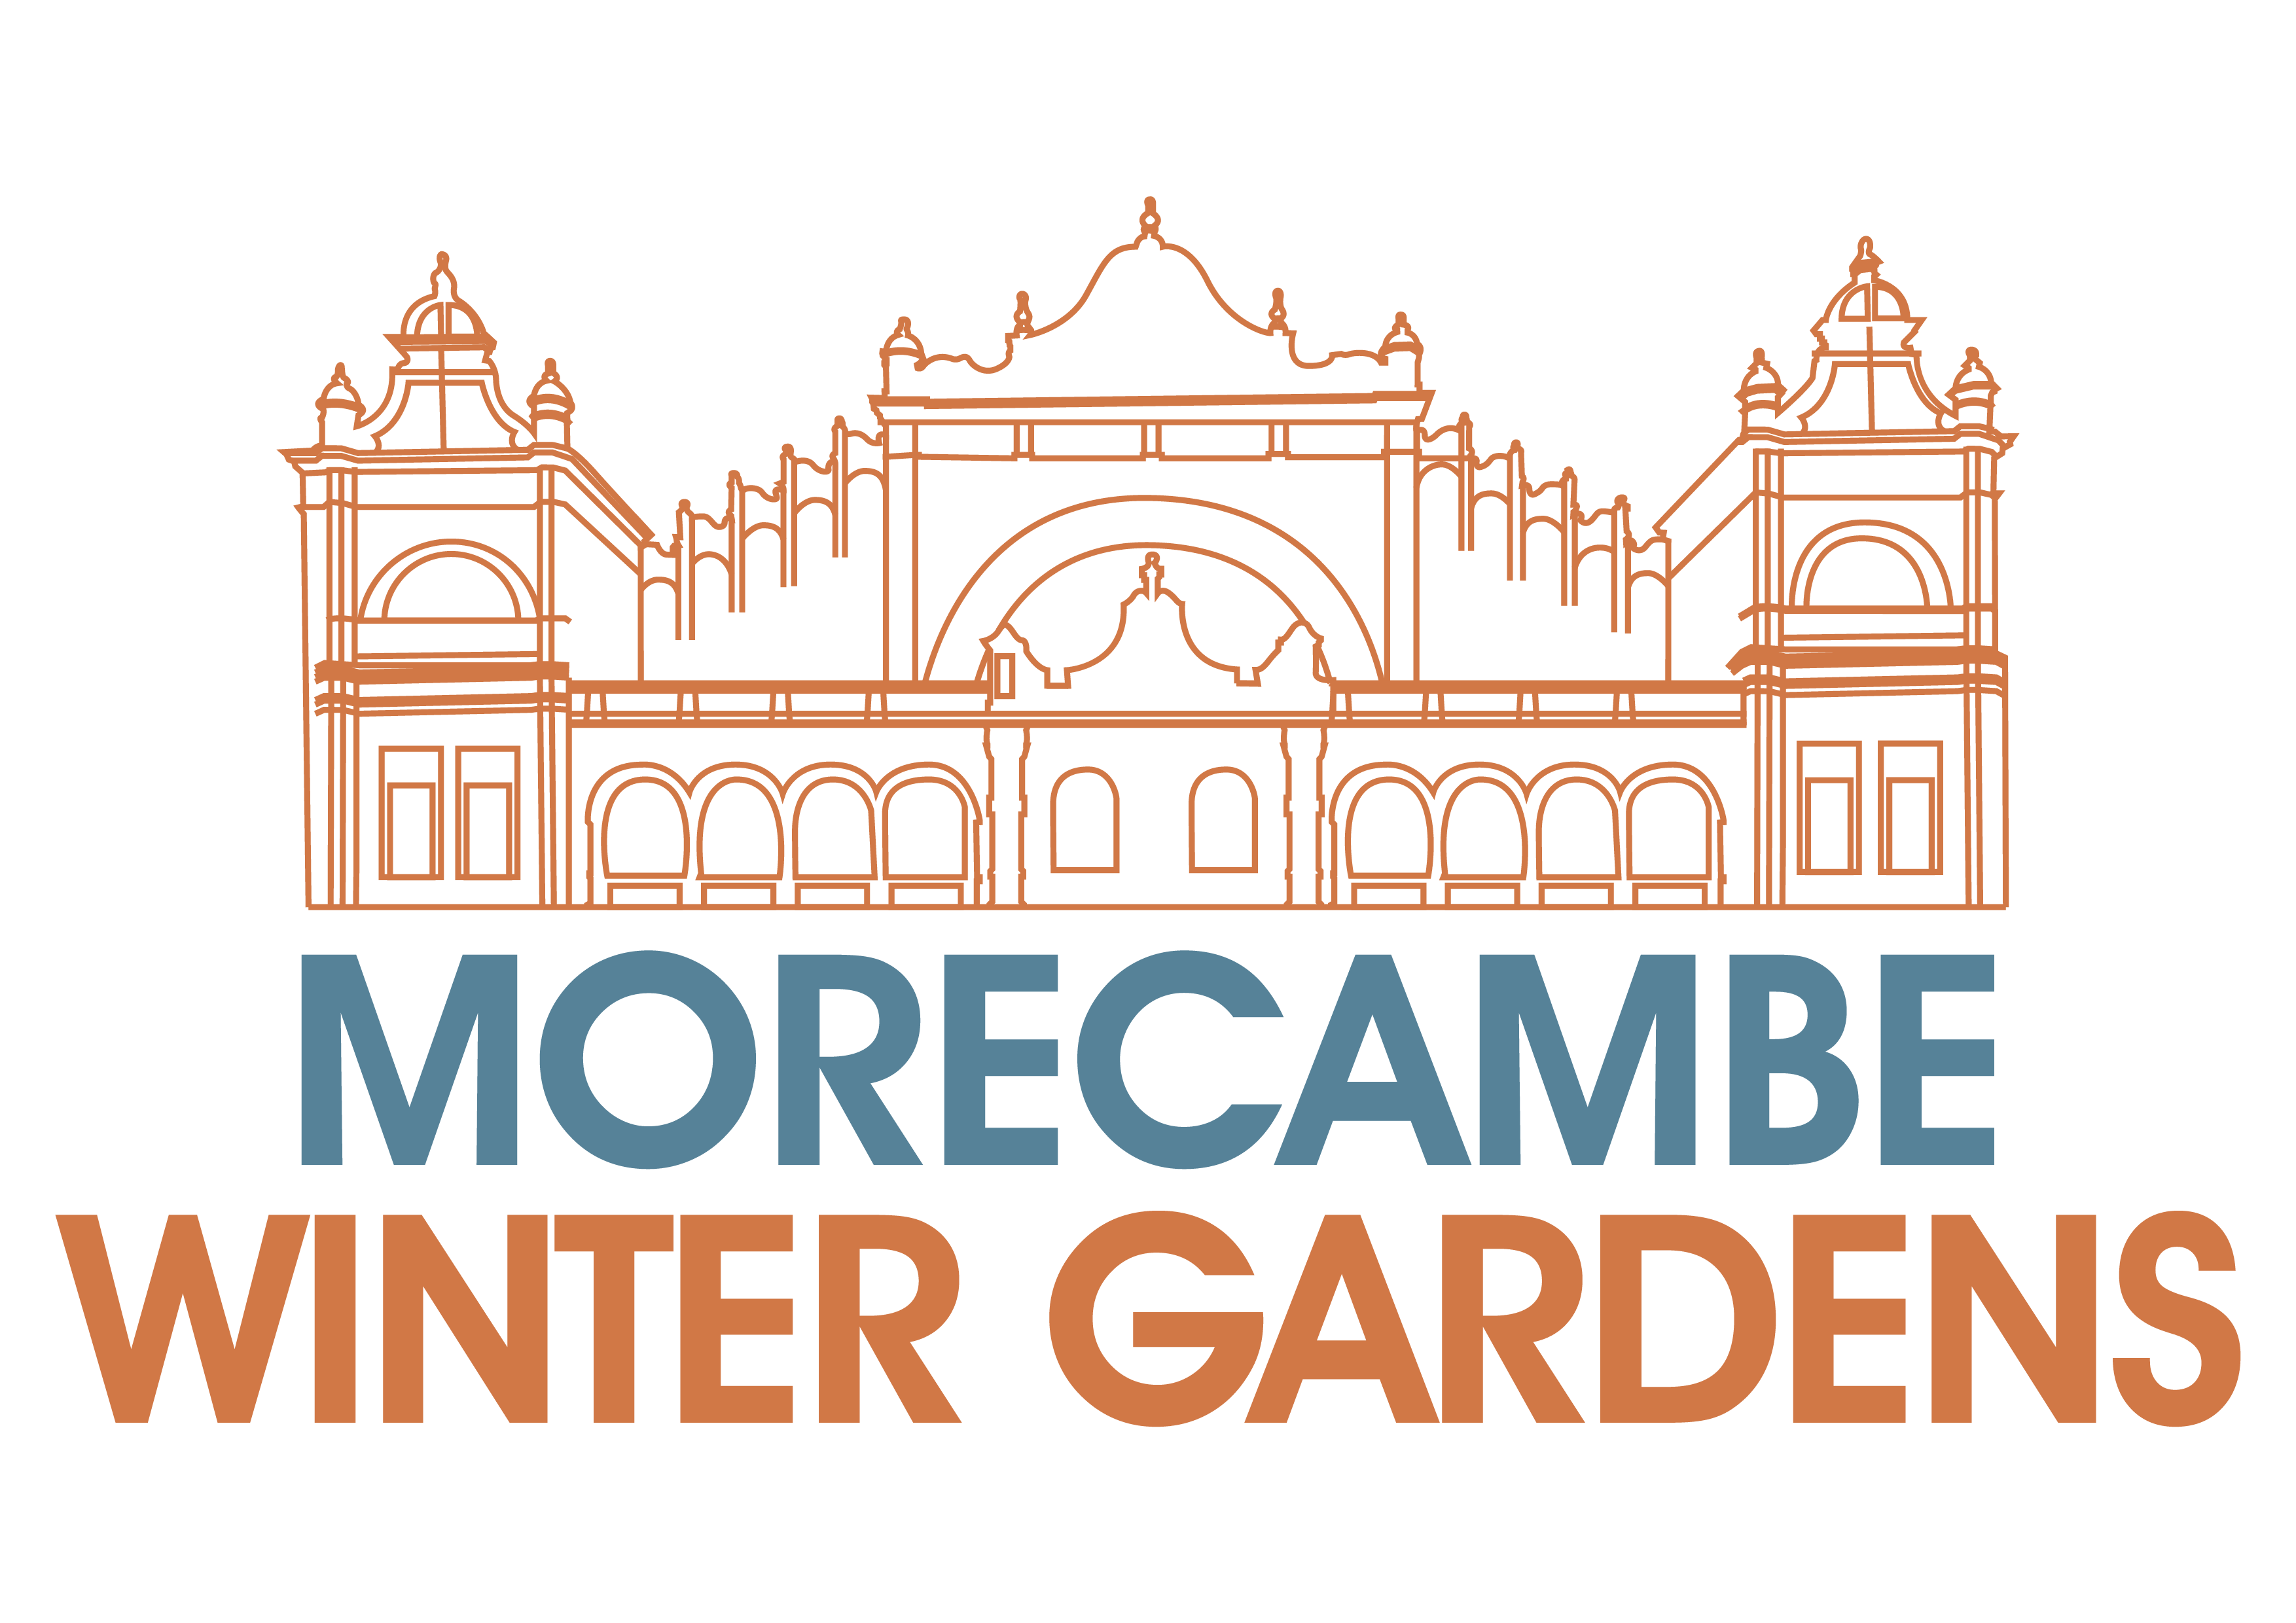 Morecambe Winter Gardens